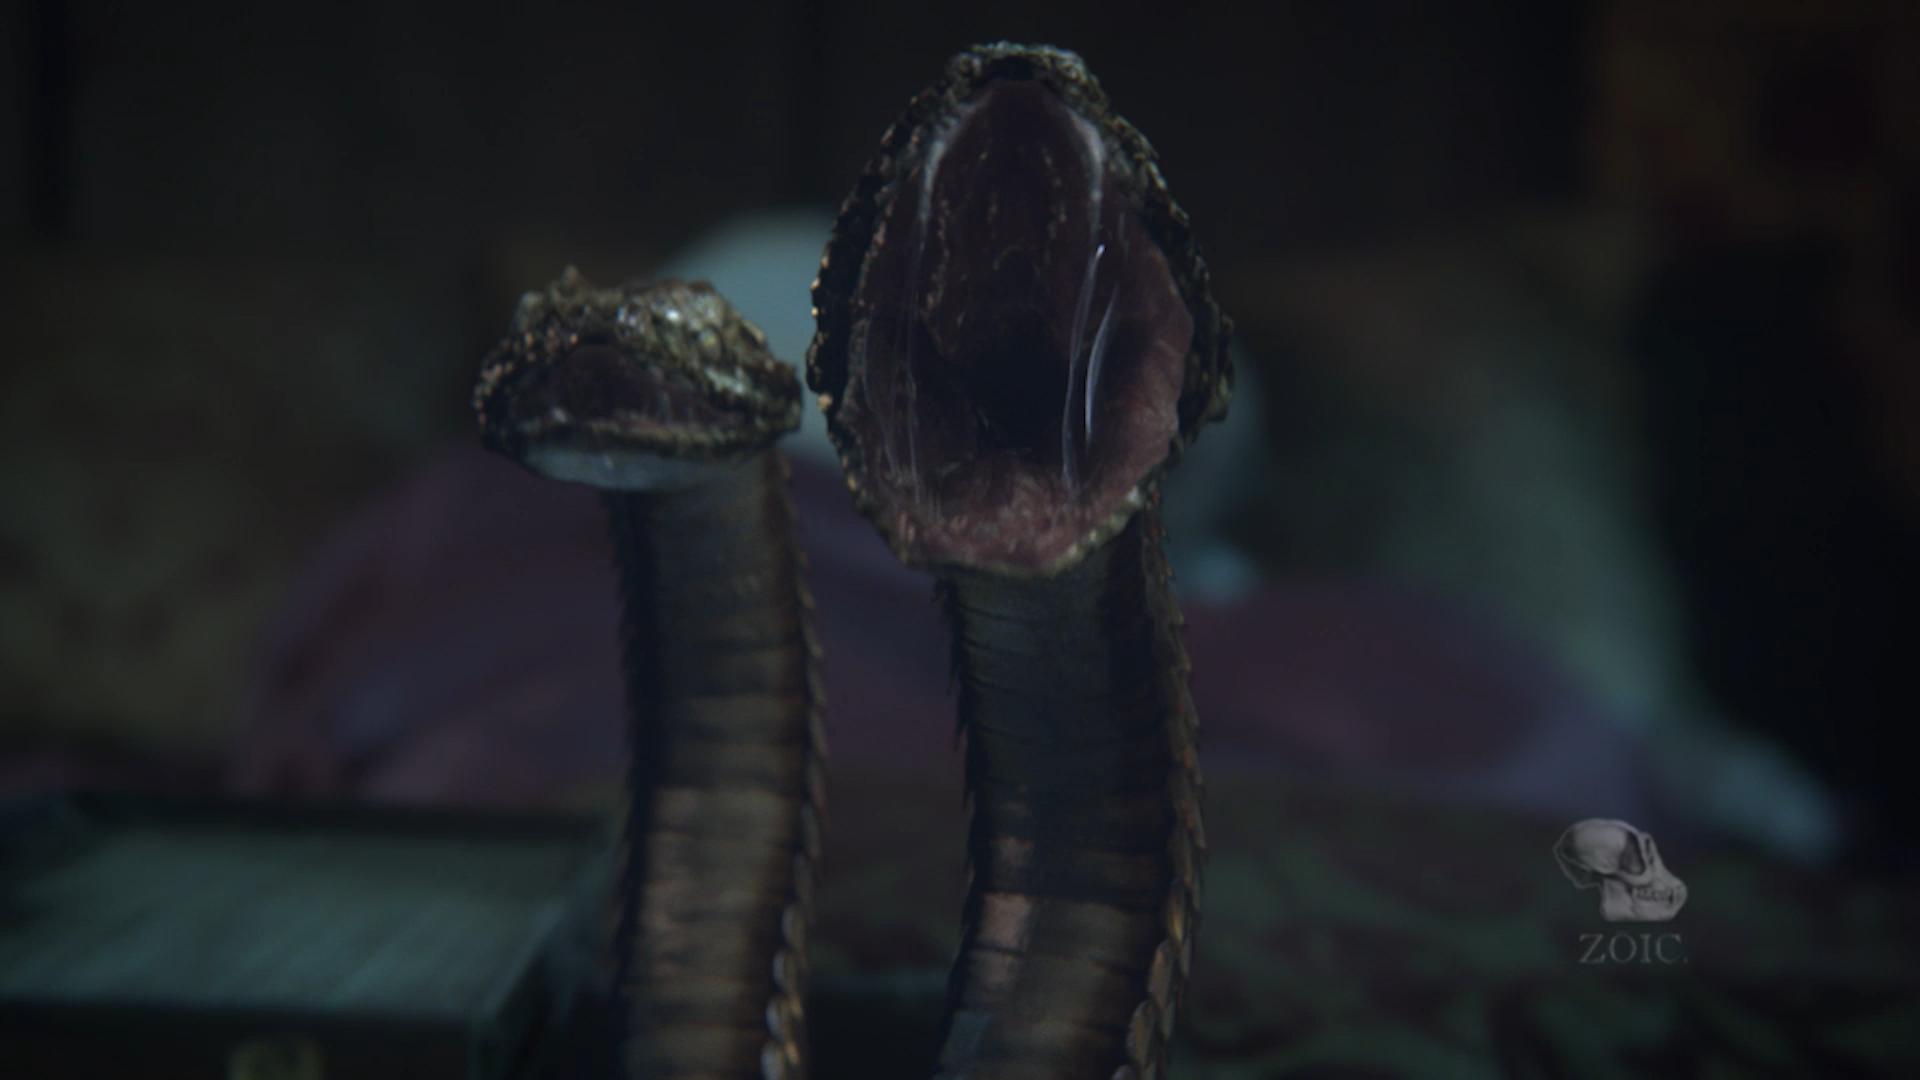 onc_snakes_v001.png